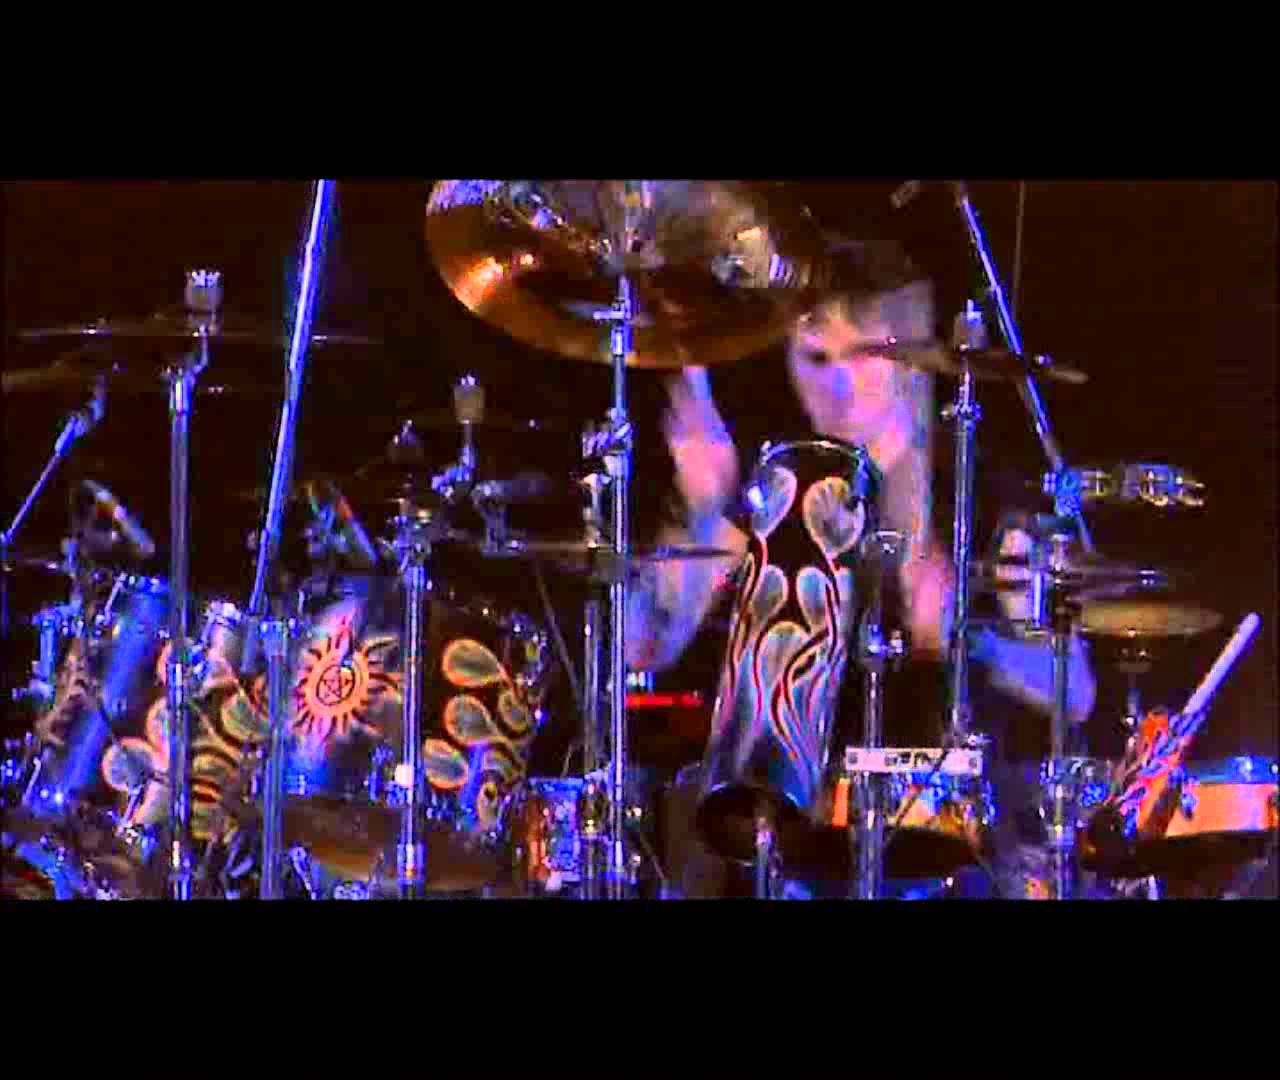 Godsmack Drum Duel Hd 1080p Sully Erna Rock Music Sully